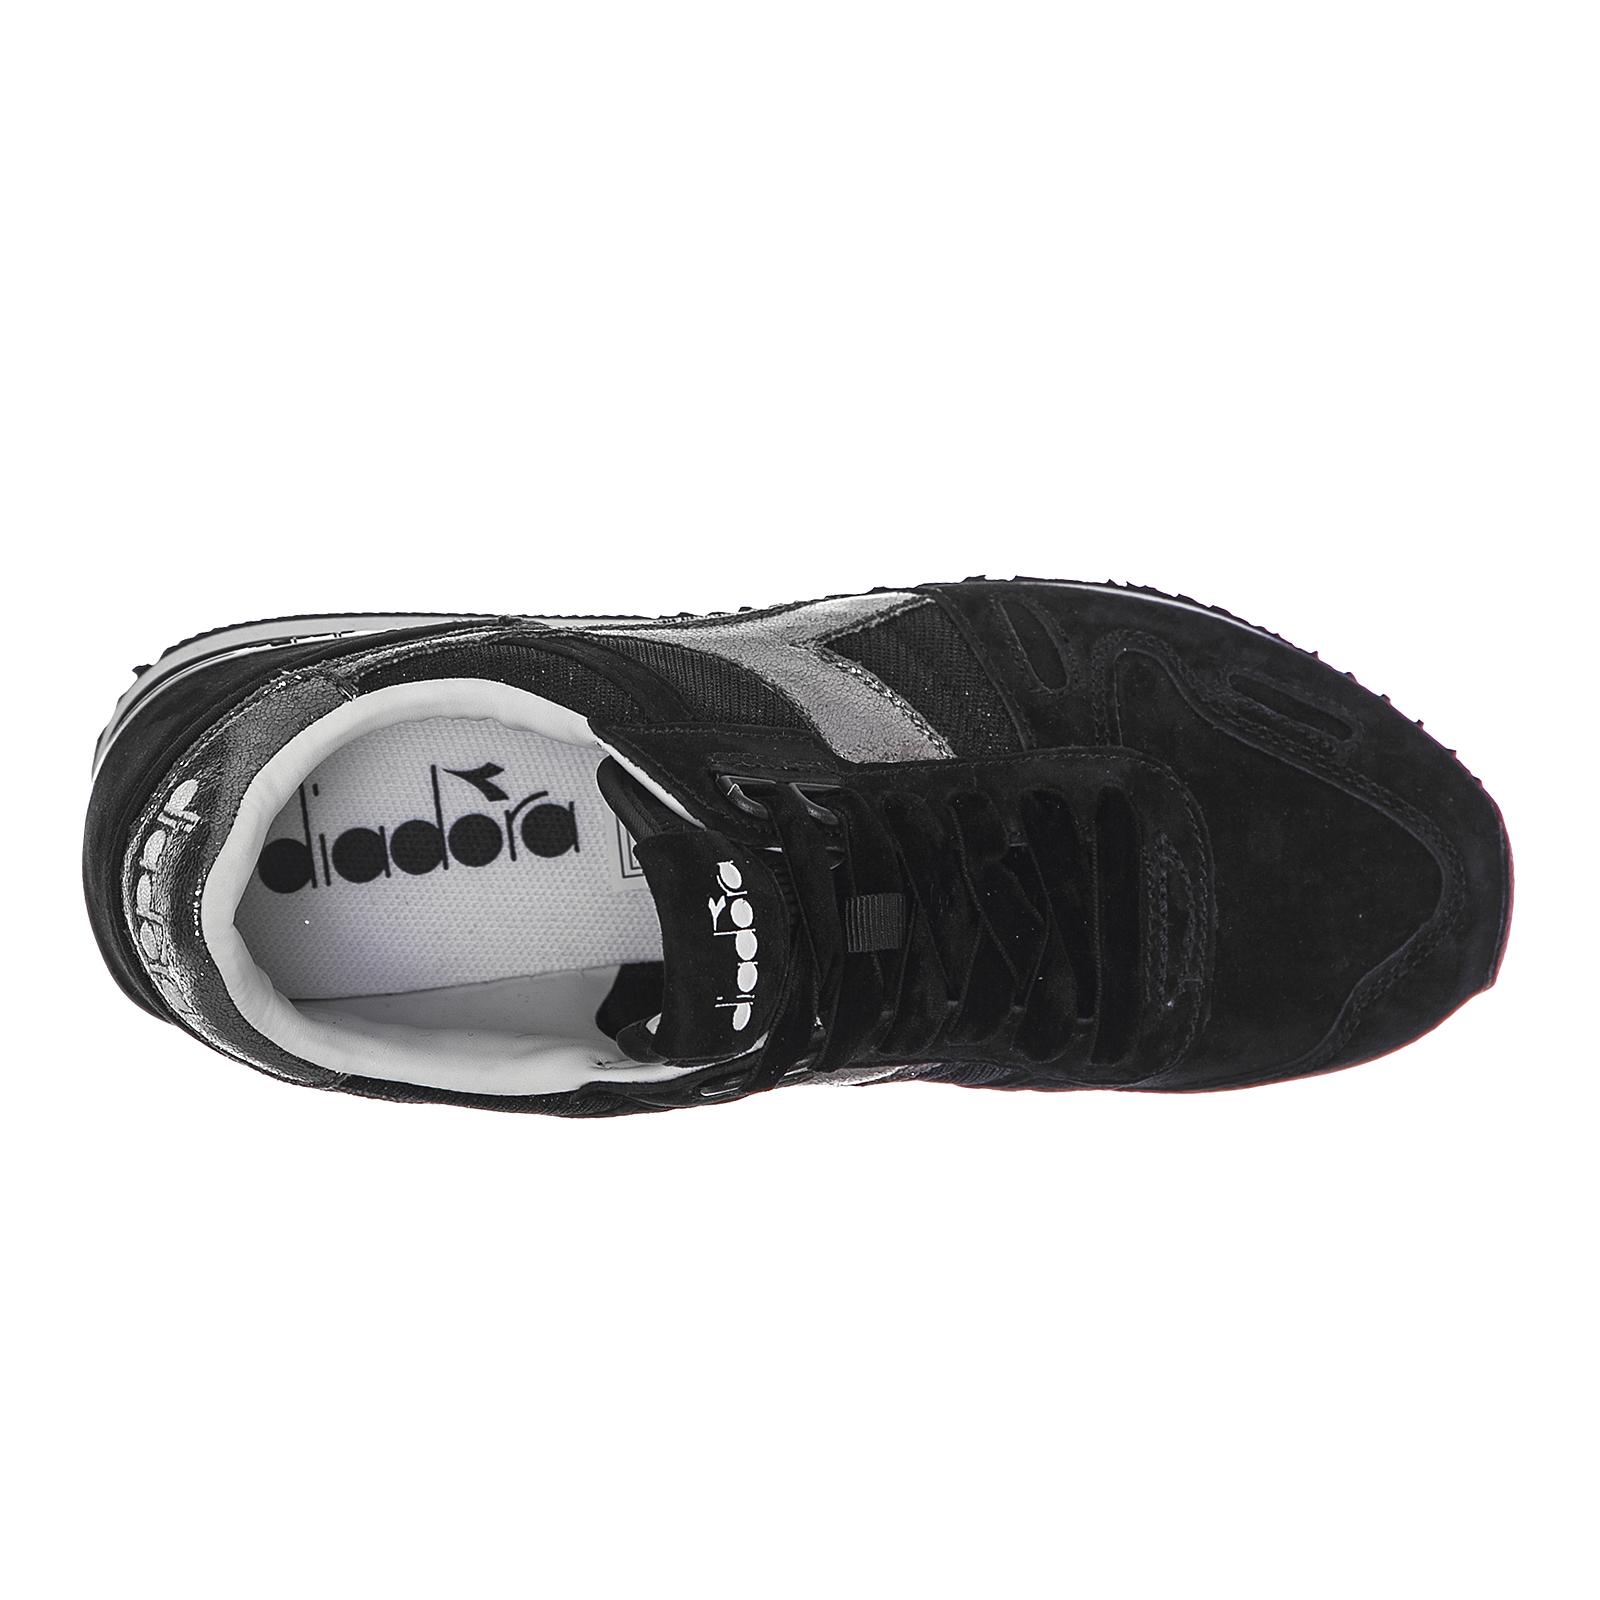 size 40 35385 4b5d7 ... Nike Air Max LTD Premium 8.5 8.5 8.5 308106 221 Baroque Brown NEW NIB  dead stock ...